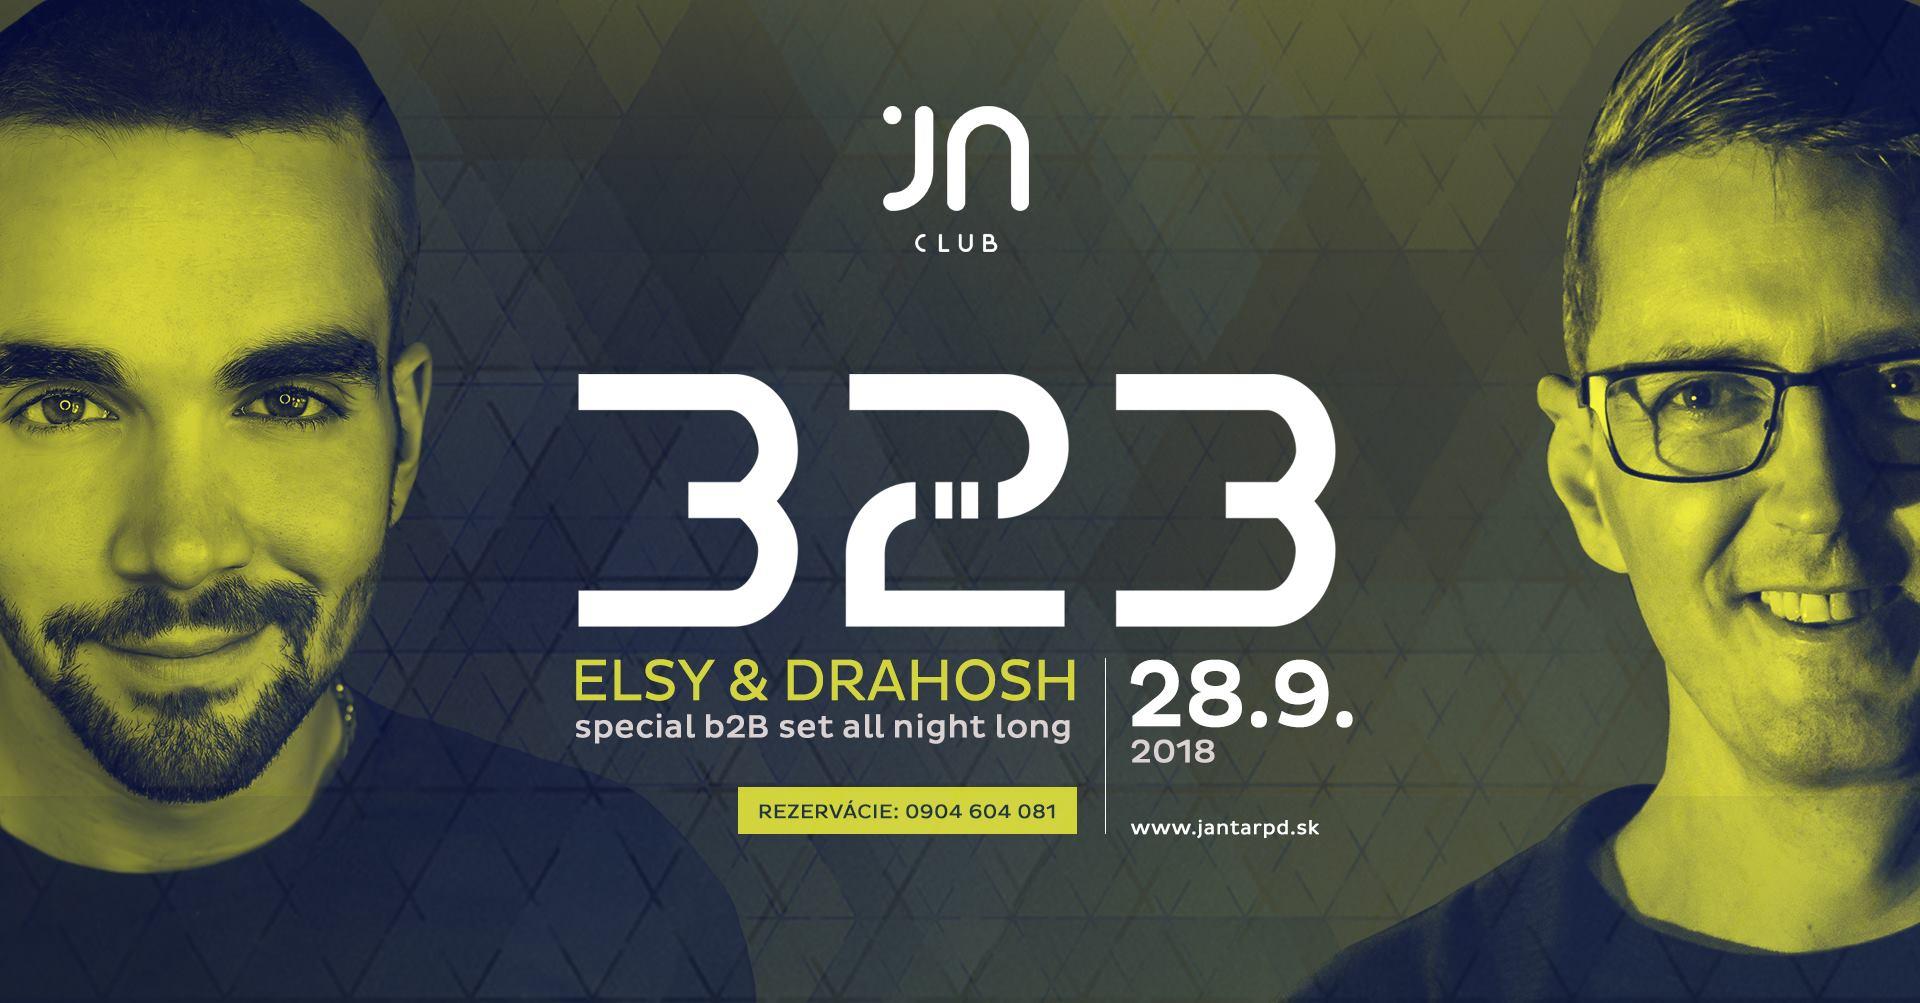 ELSY B2B Drahosh at Jantar Club